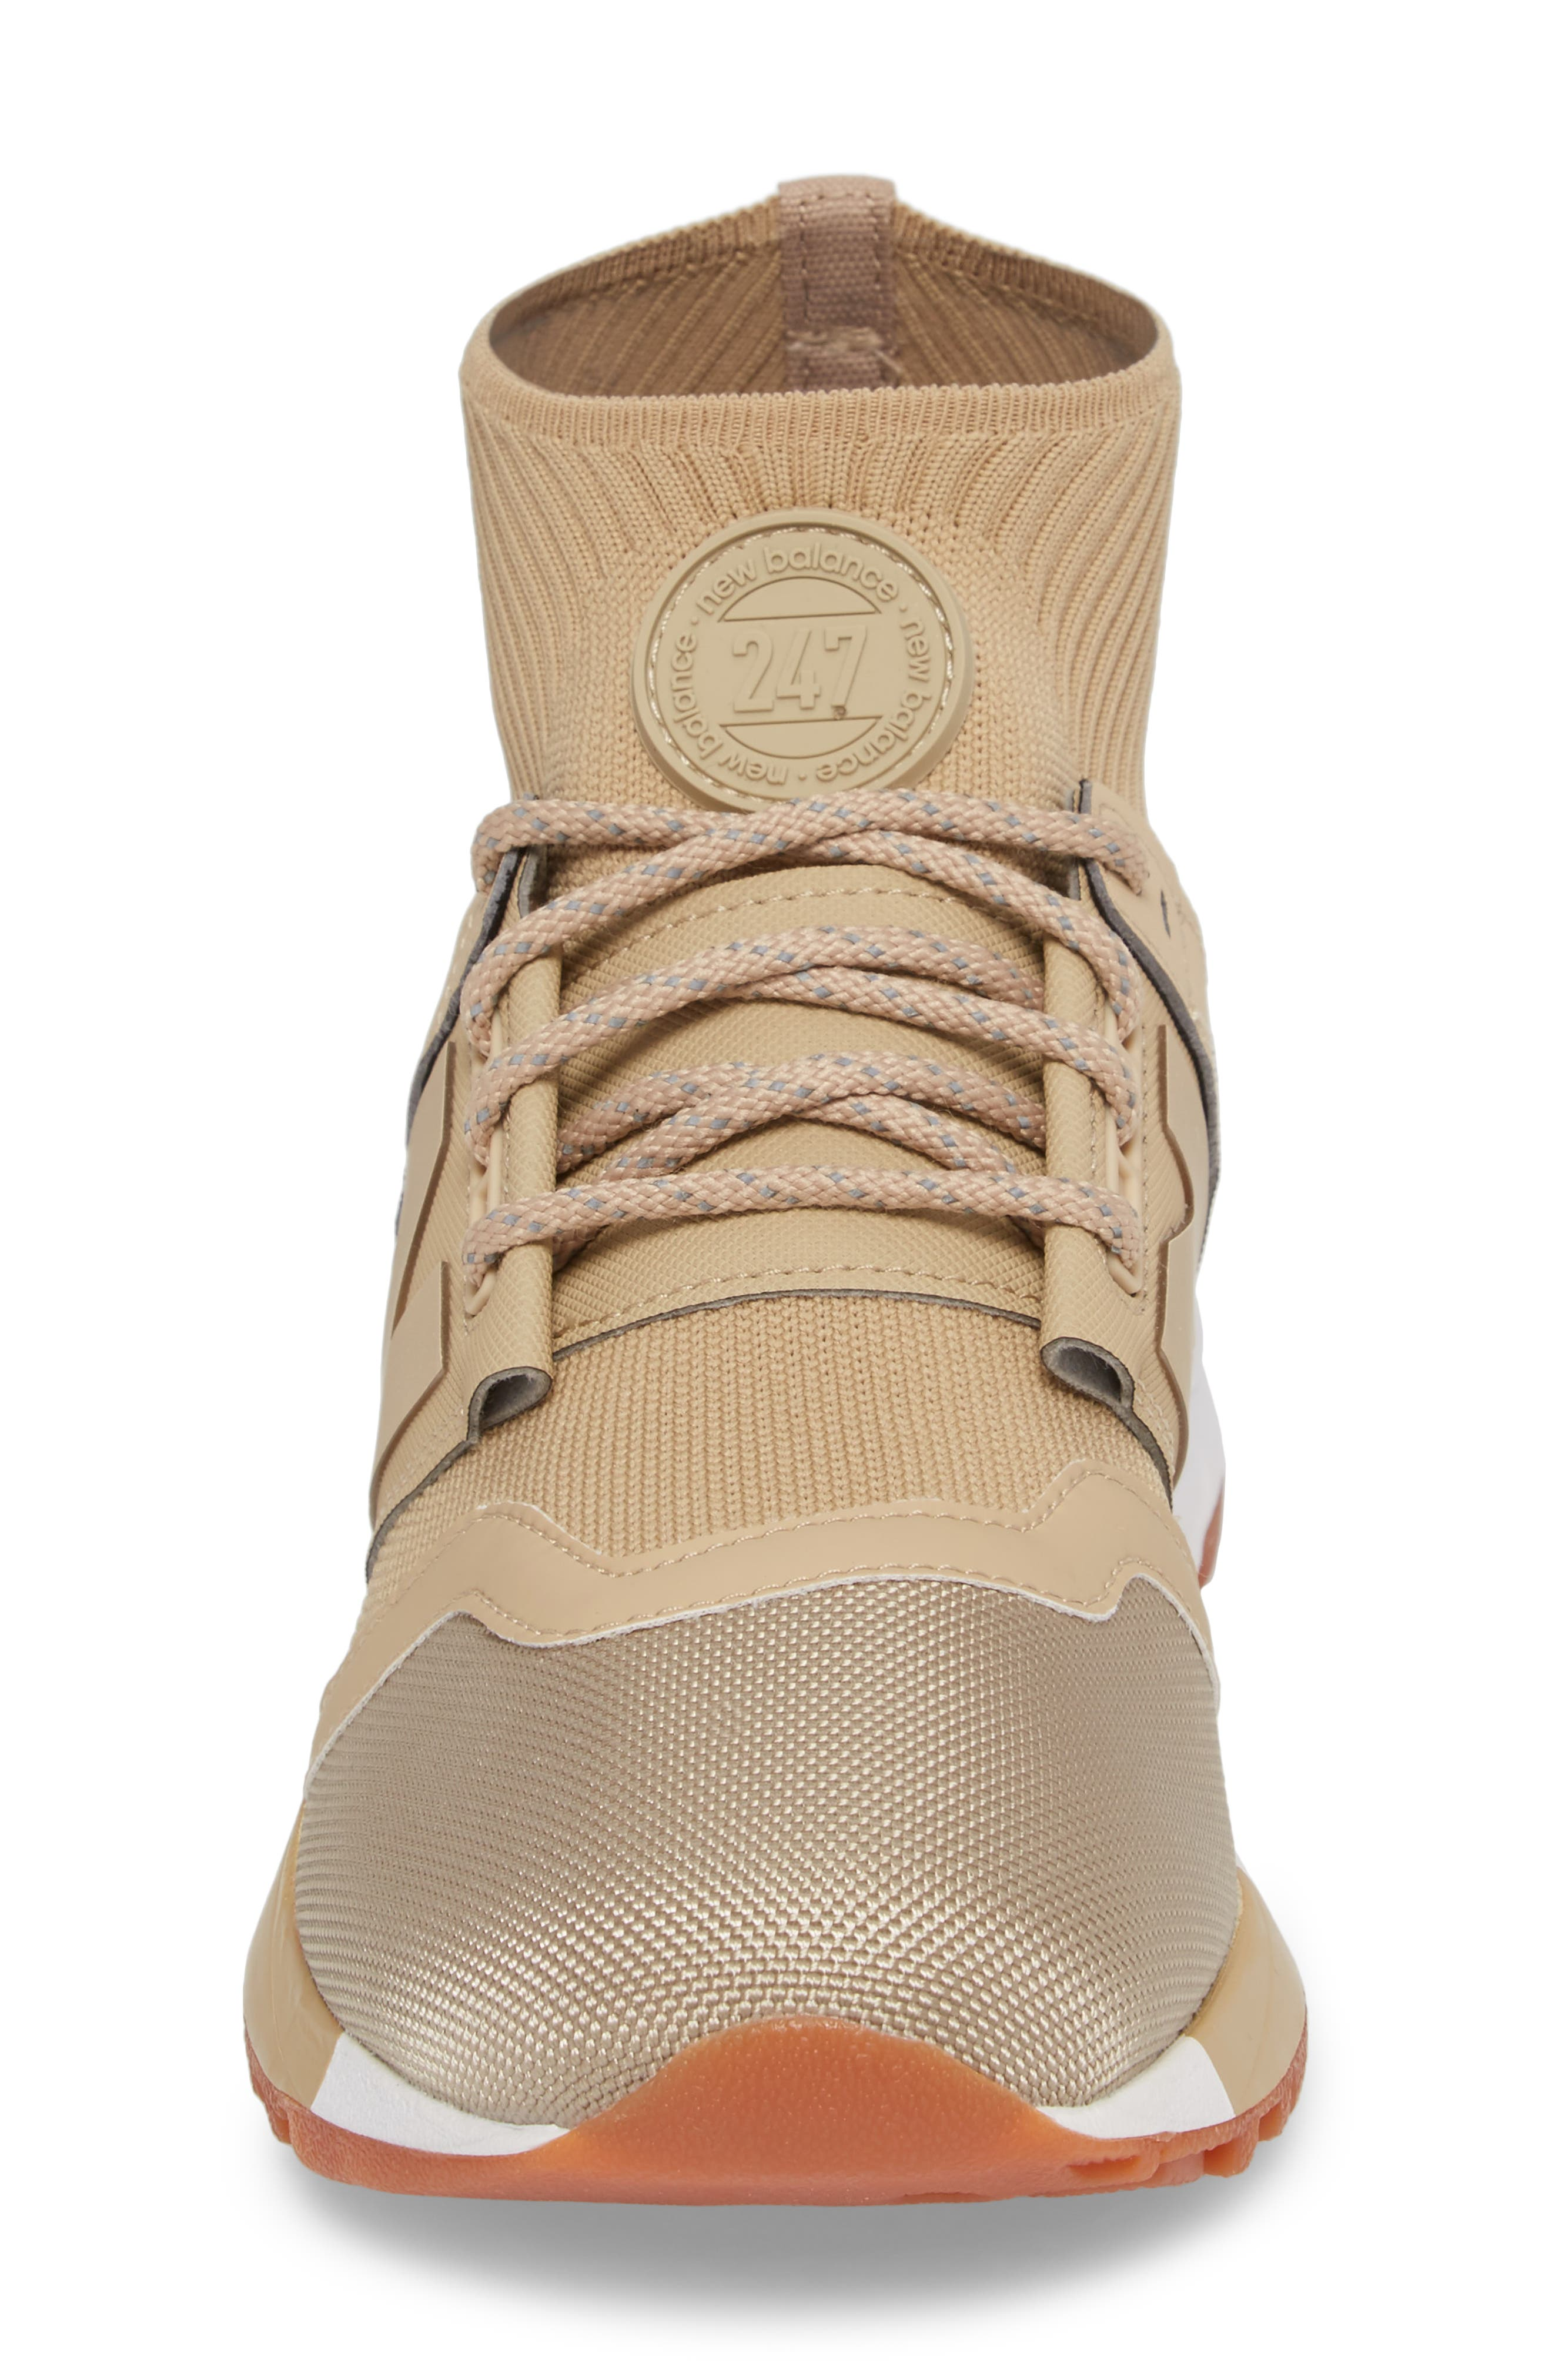 247 Mid Sneaker,                             Alternate thumbnail 15, color,